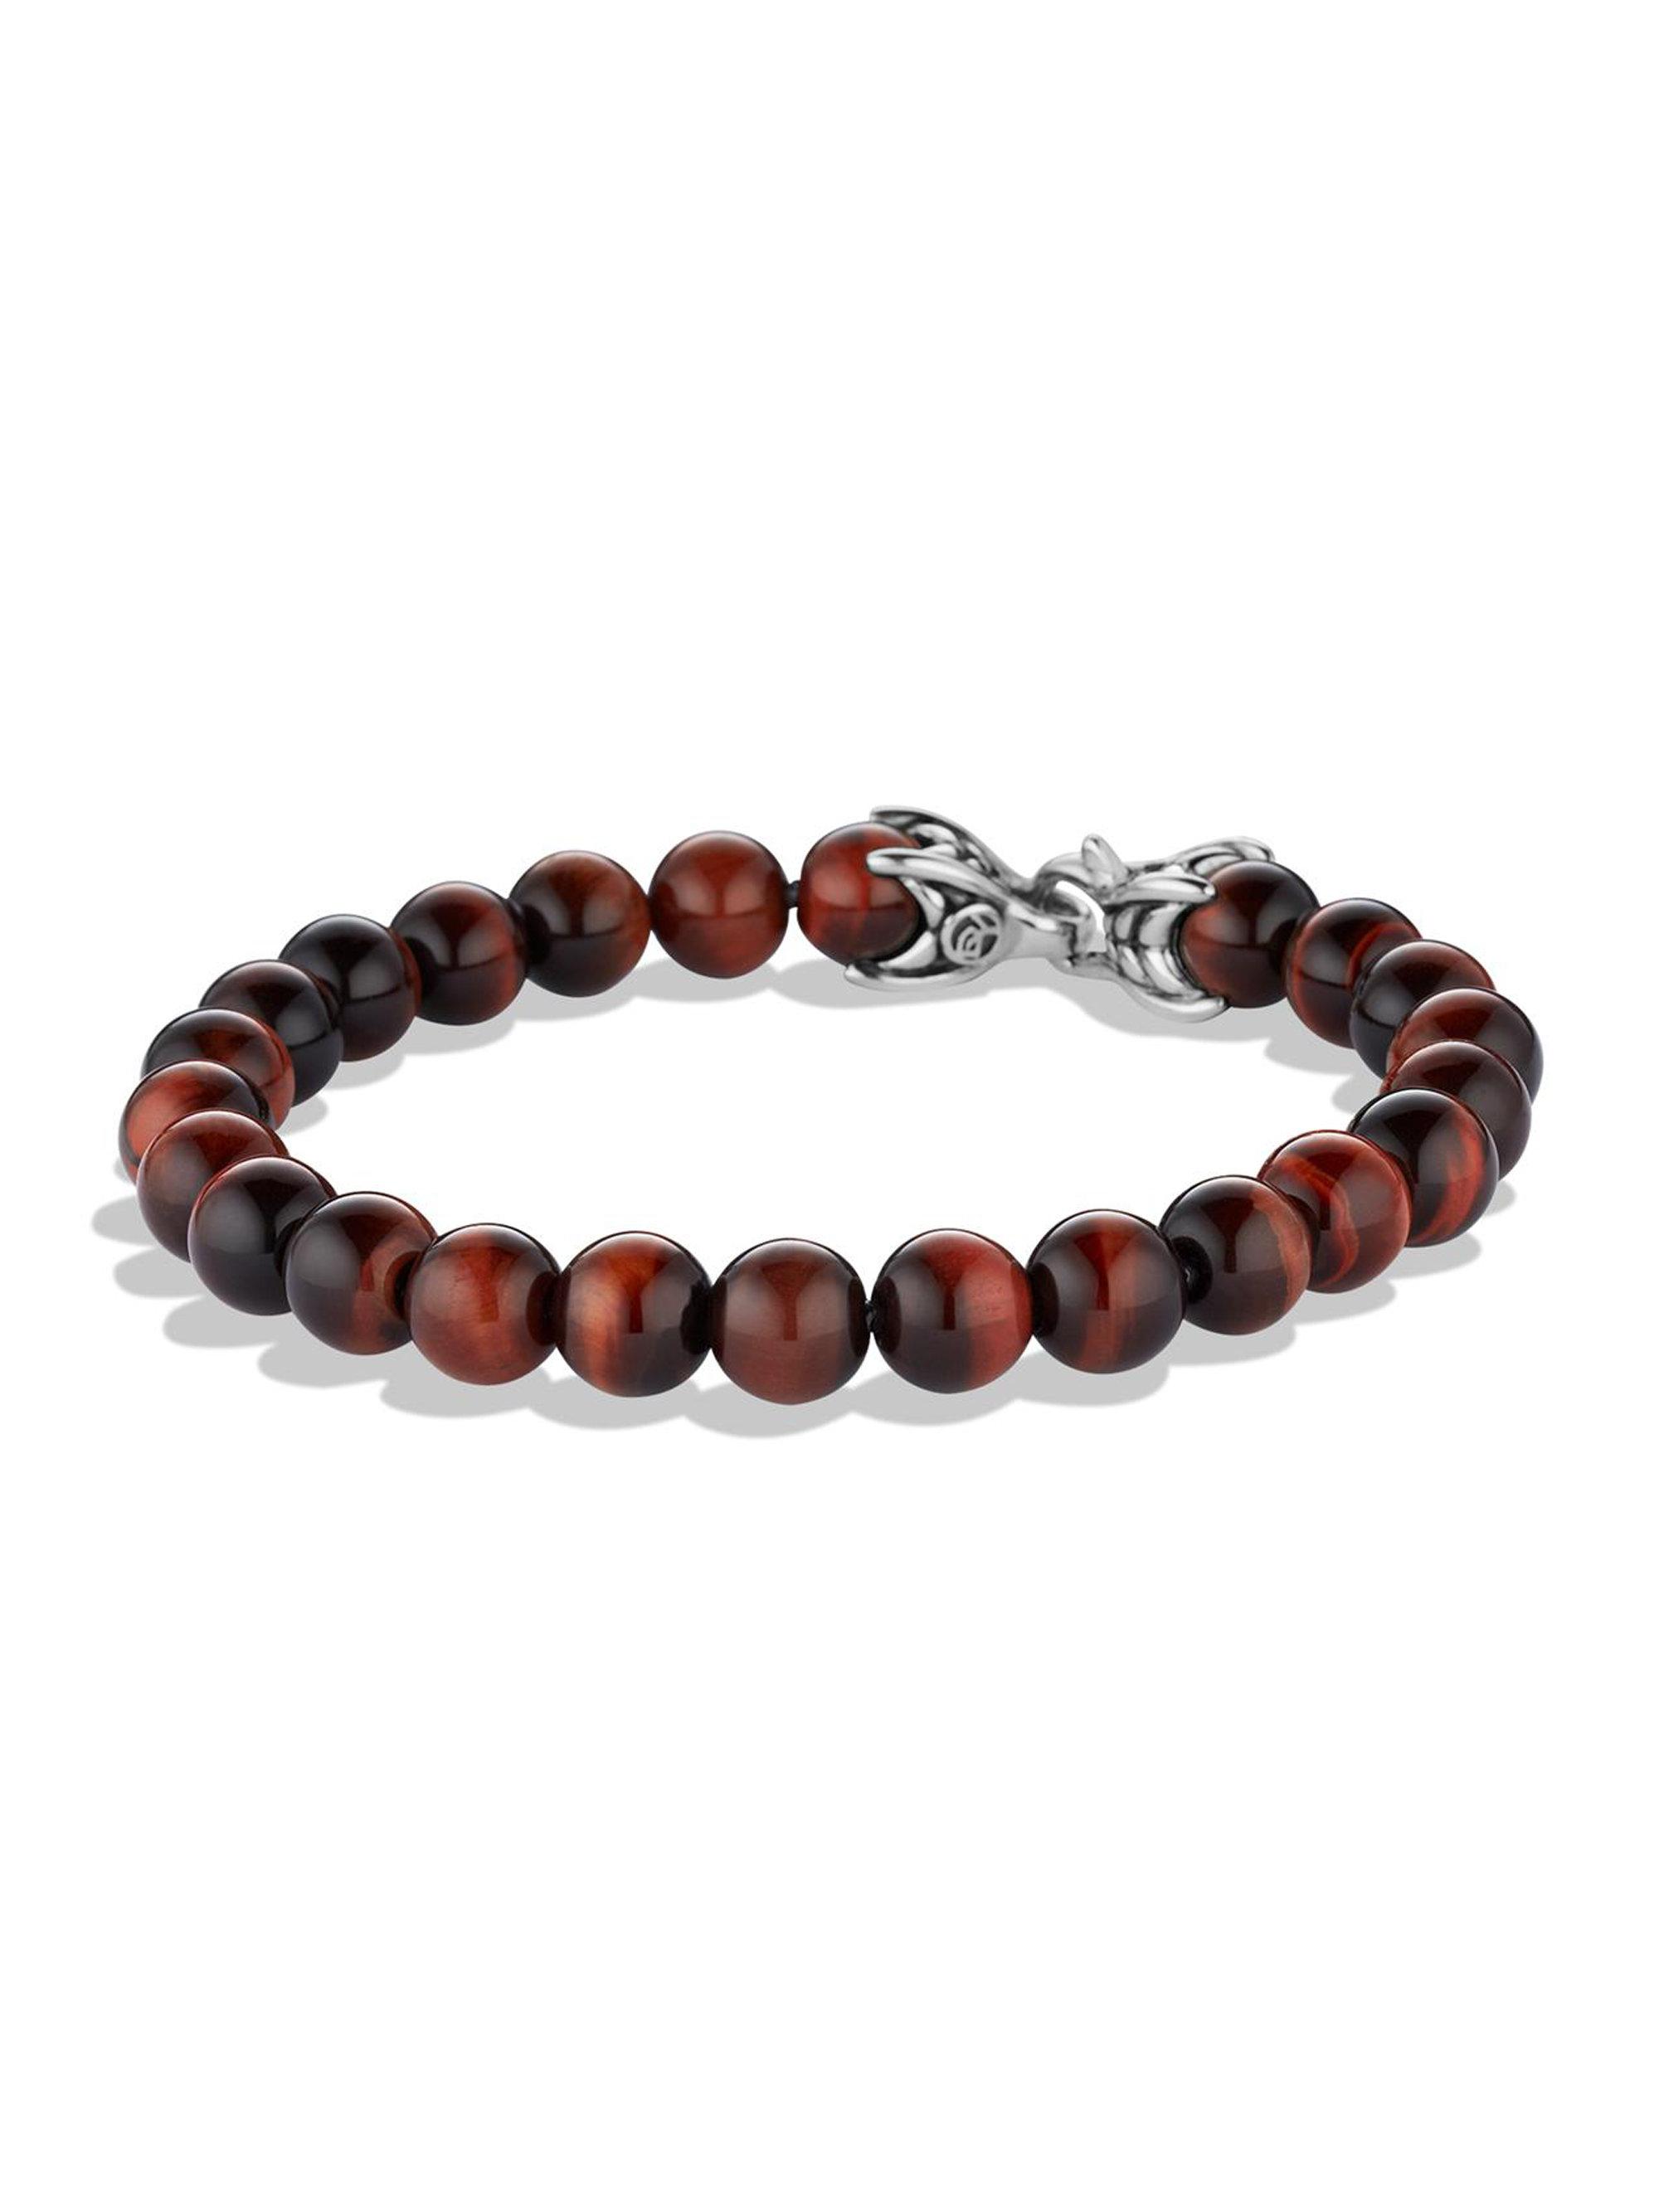 David Yurman Spiritual Beads tiger eye bracelet - Brown eWp3u